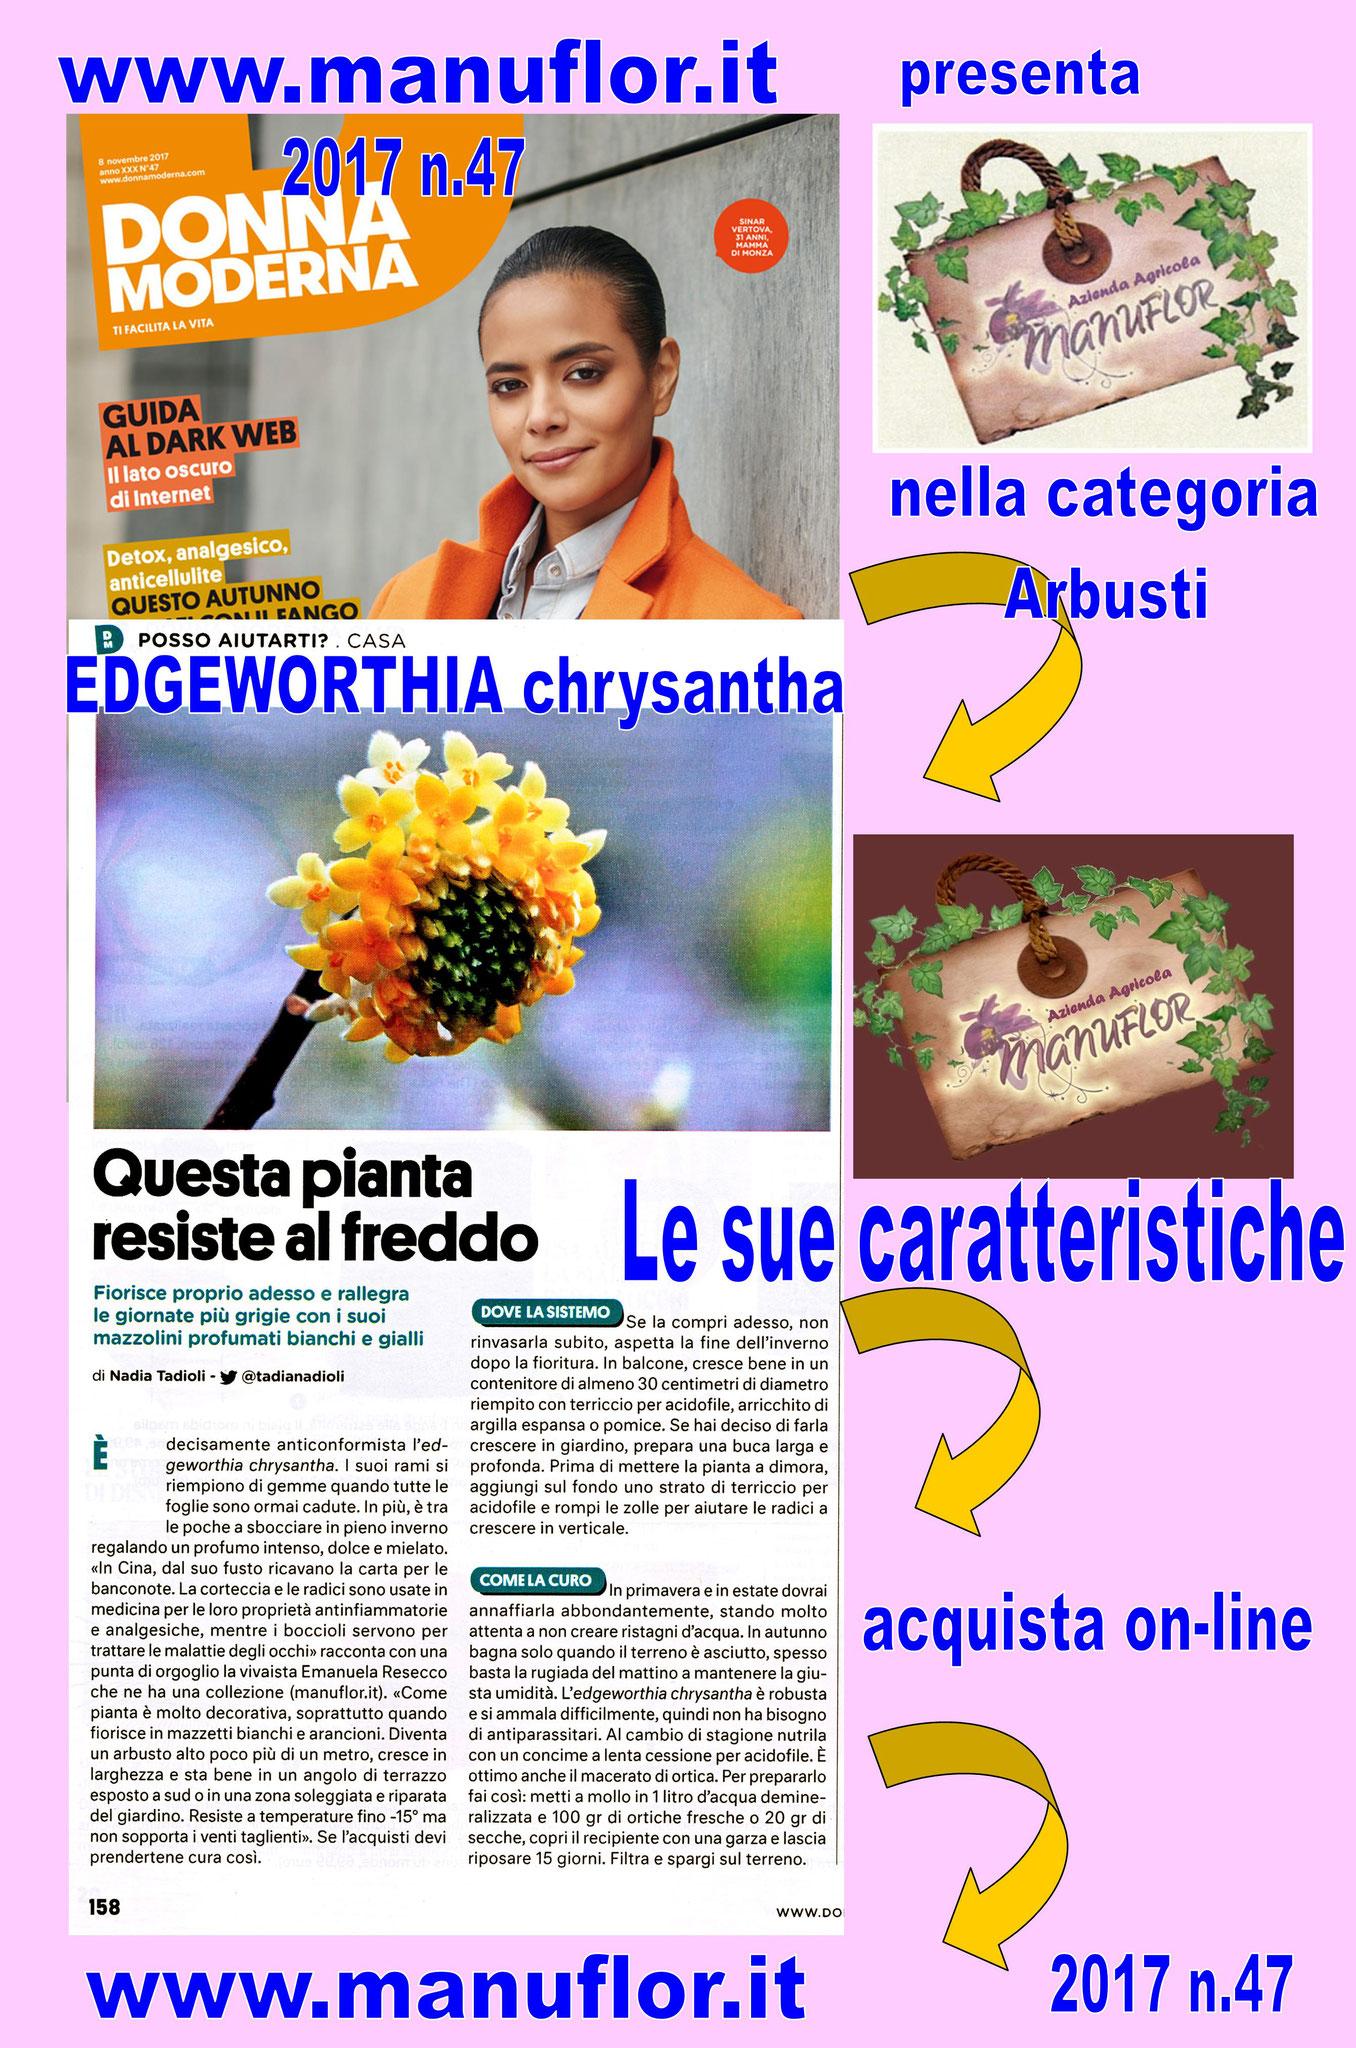 2017 - Nadia Tadioli, parla di #Manuflor su Donna Moderna. Scelta per voi : EDGEWORTHIA chrysantha